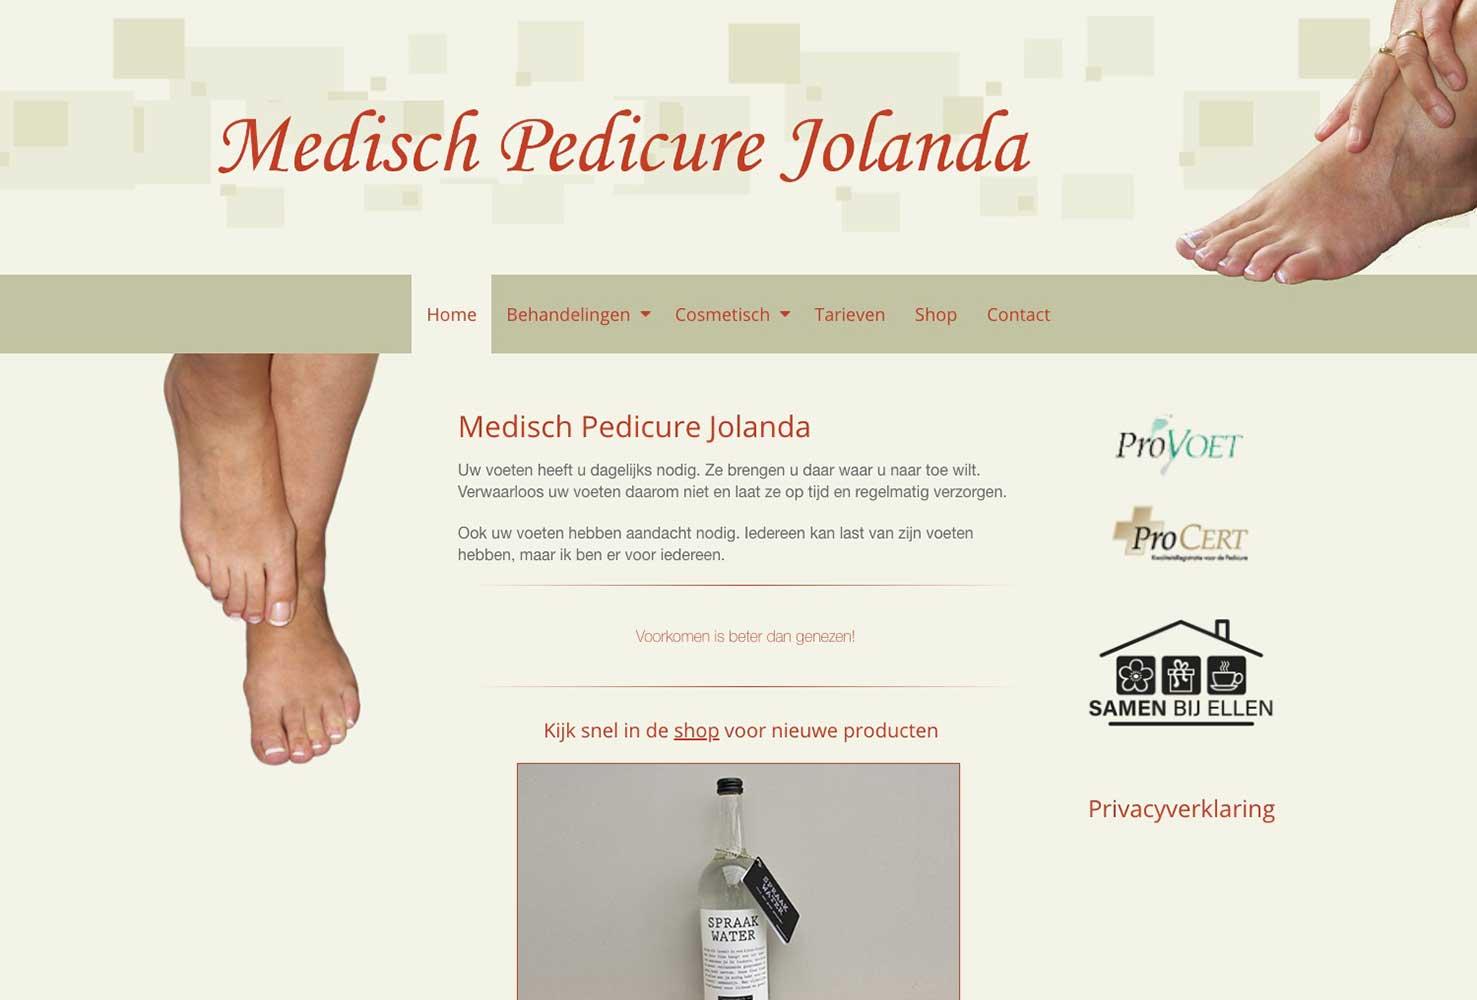 Medisch pedicure Jolanda